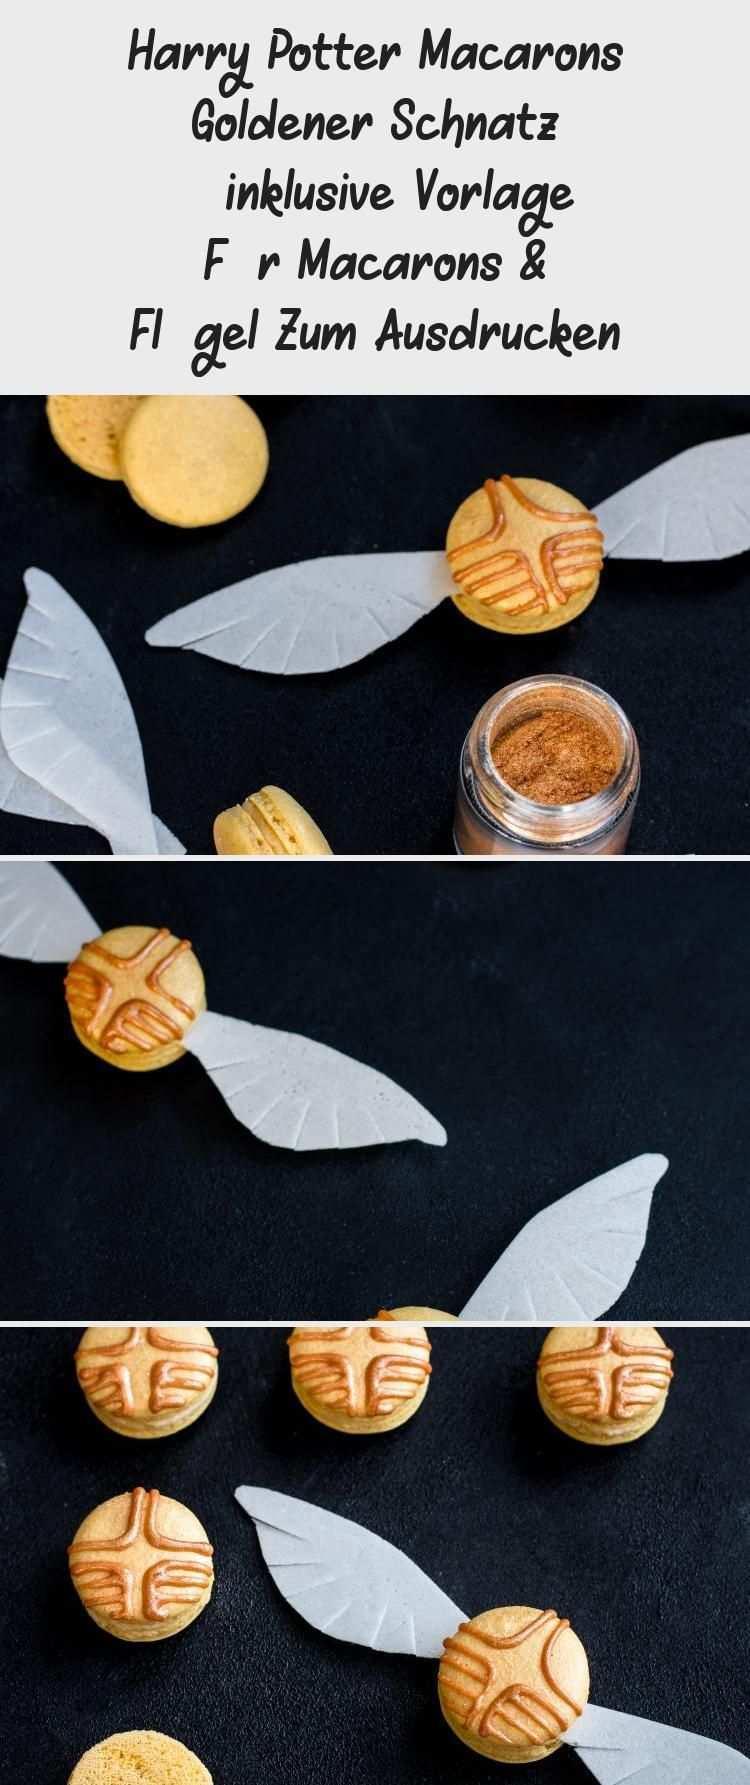 Anleitung Rezept Harry Potter Macarons Goldener Schnatz Inklusive Vorlage Fur Macarons Flugel Zum Ausdrucken Macarons Macarons Rezept Goldener Schnatz